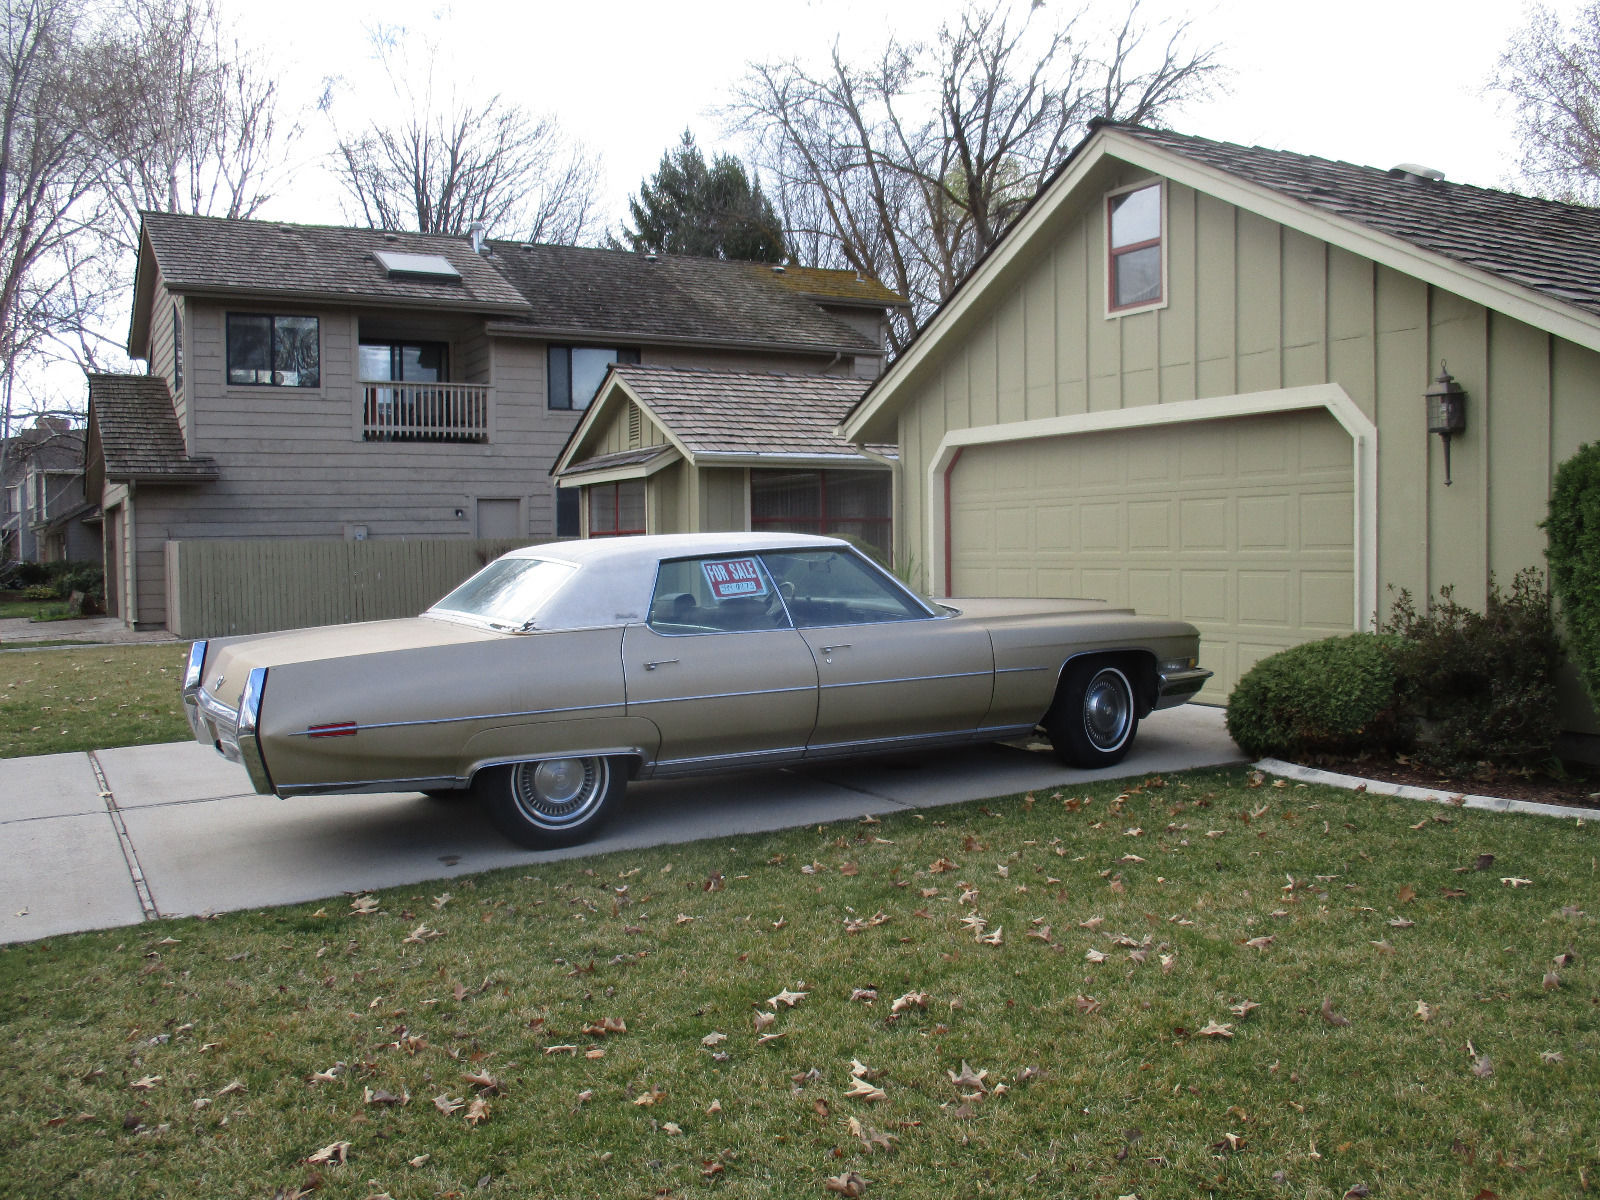 1972 Cadillac Deville Sedan For Sale